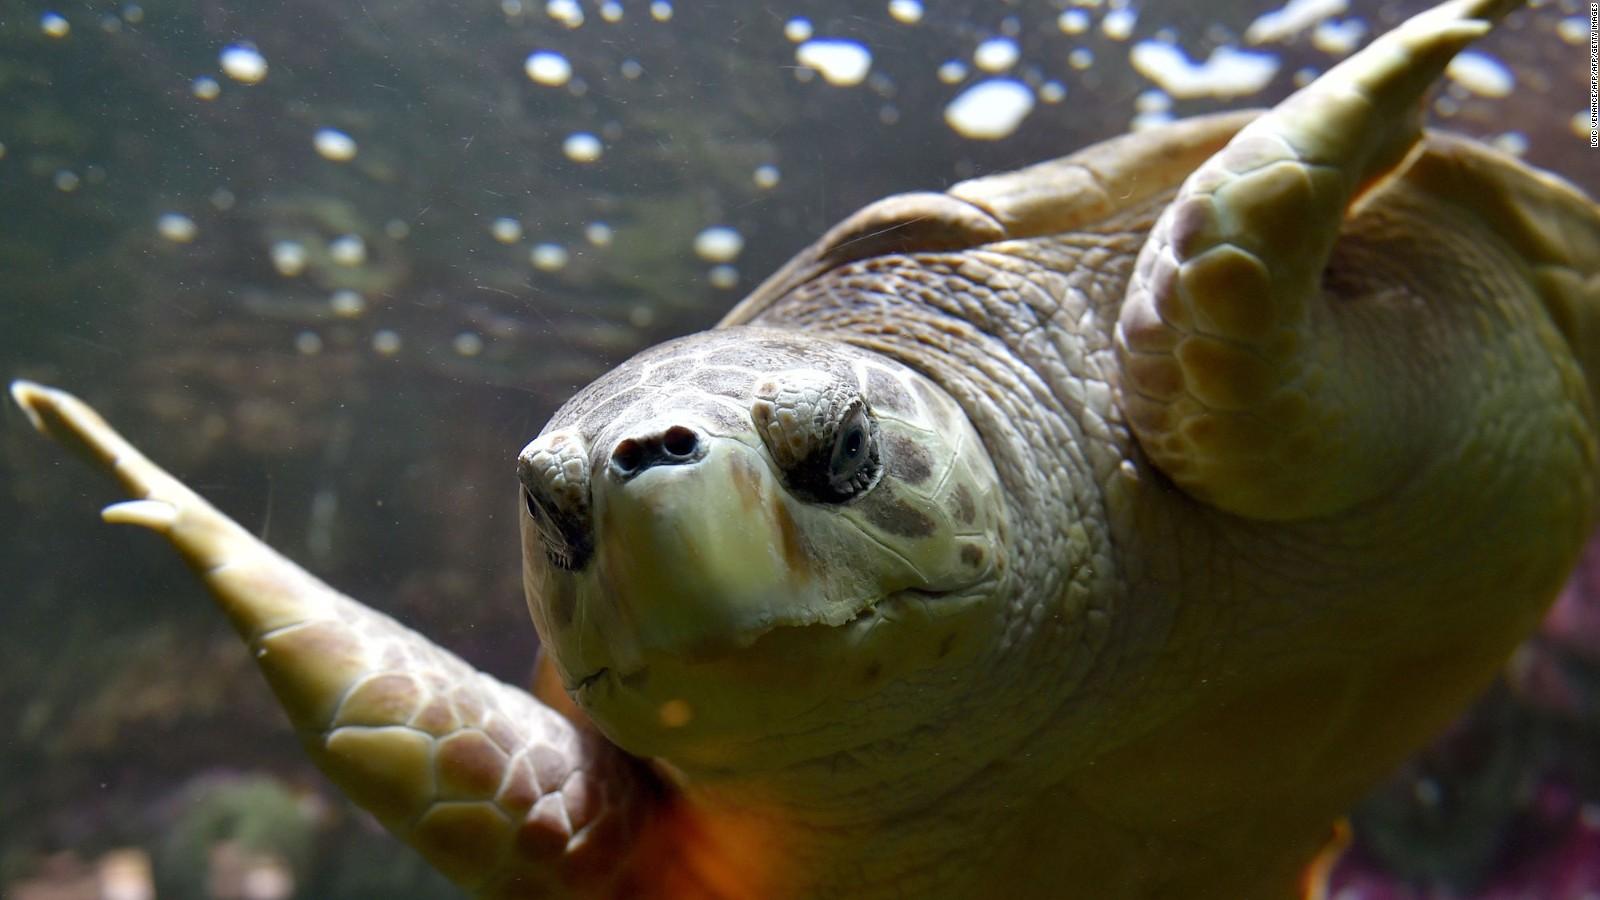 Will China's Hainan Island again host rare sea turtles